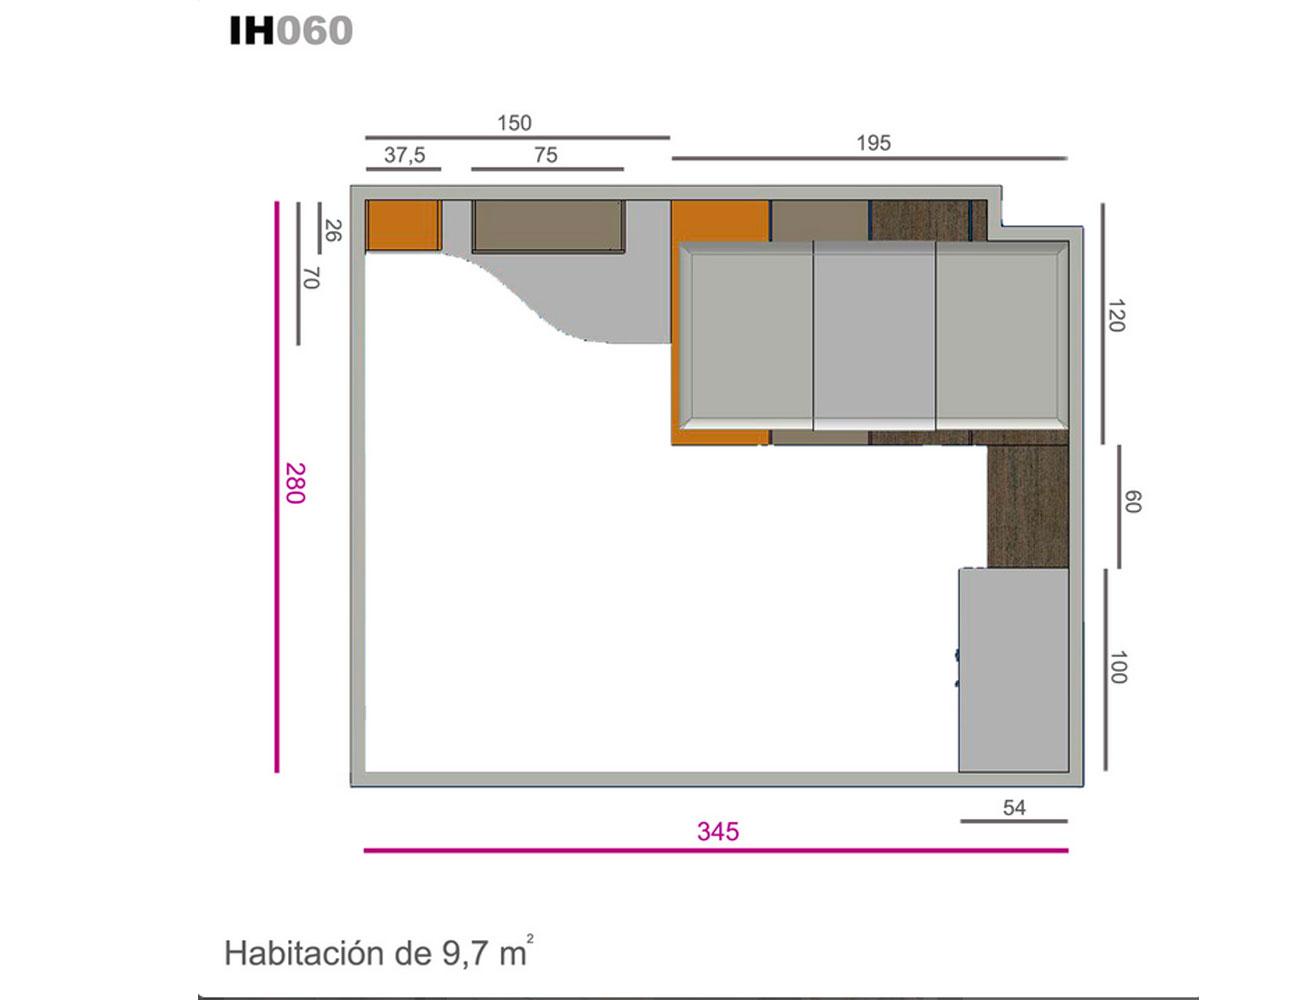 Ih060 medidas